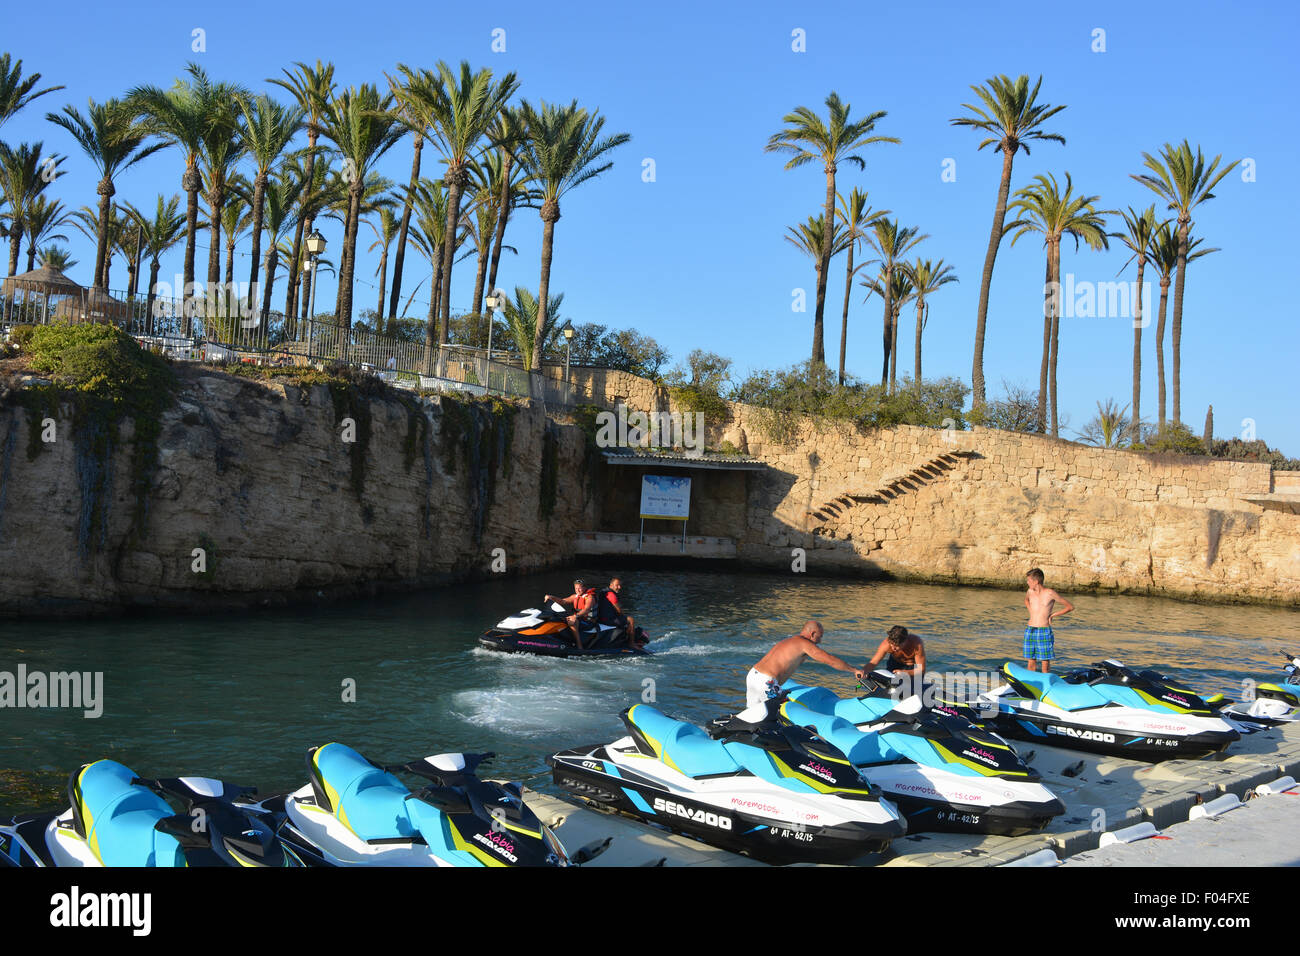 Jetskis mieten im Seebad Stadt Javea an der Costa Blanca, Spanien. Stockbild